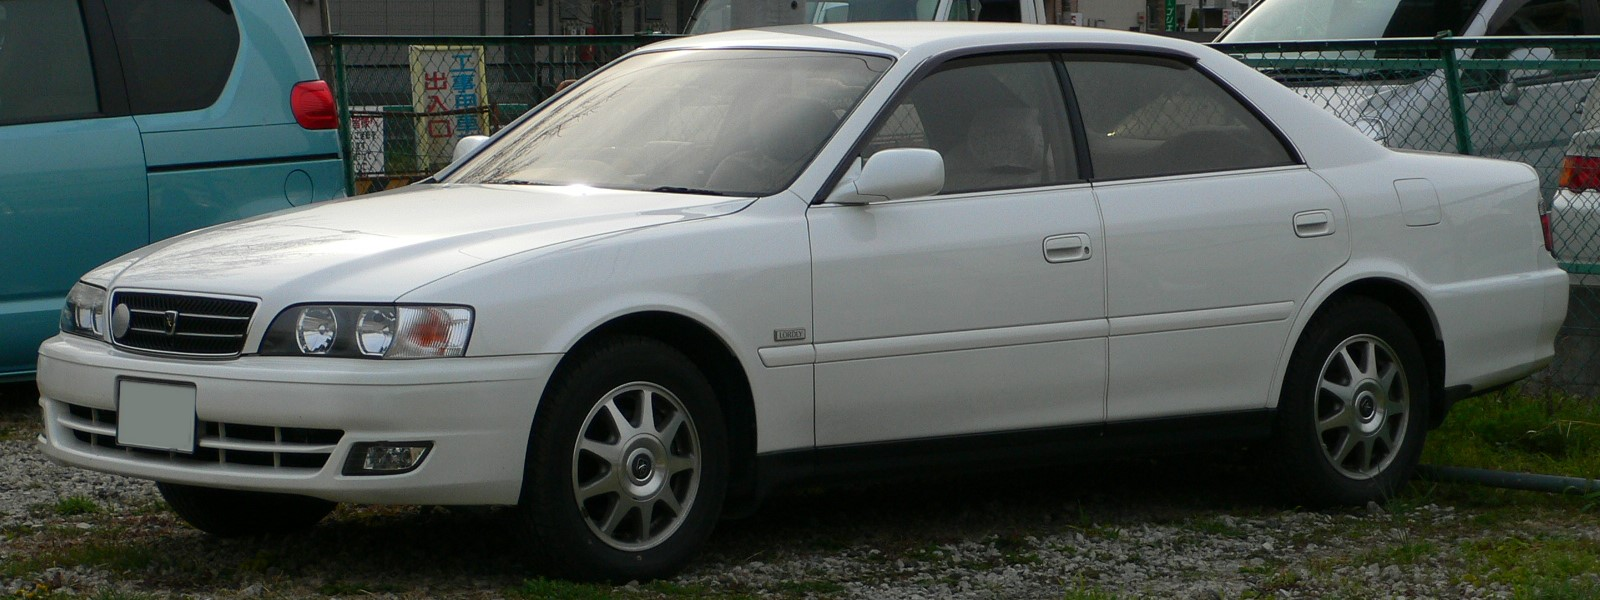 Toyota Chaser (X100)